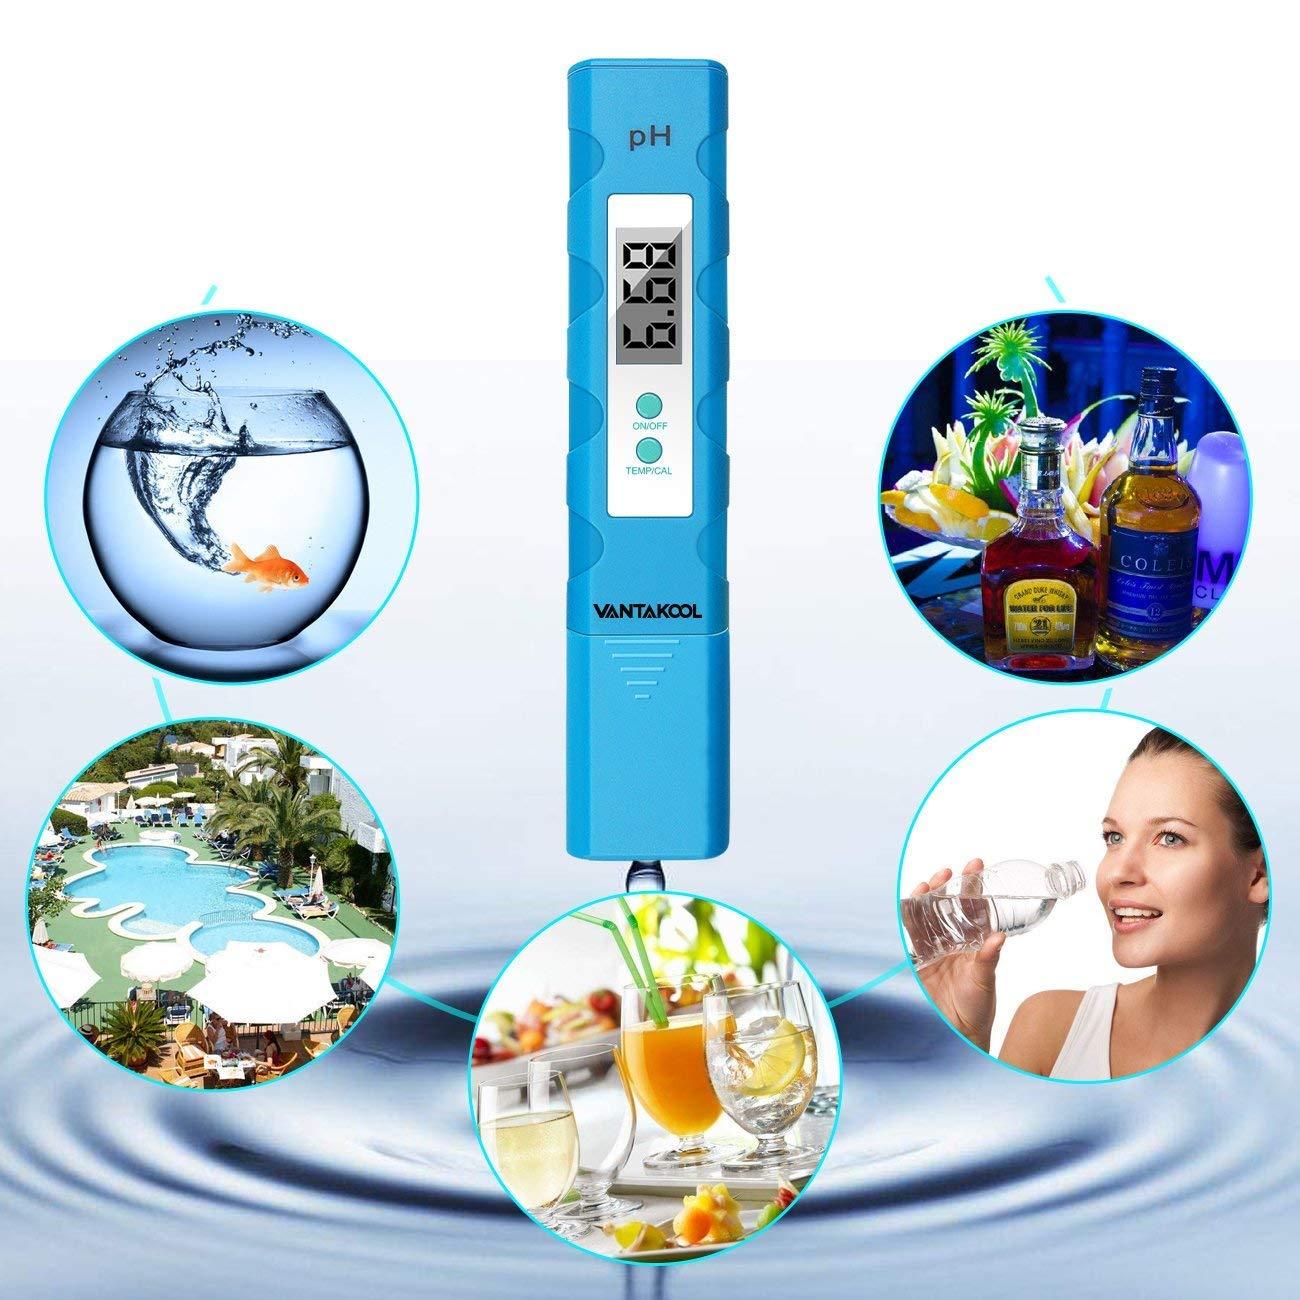 Yellow VantaKool PH Meter Cakie Digital Meter Pool and Aquarium Water PH Tester Design with ATC 0.01 High Accuracy Quality 0-14 Measurement Range for Household Drinking